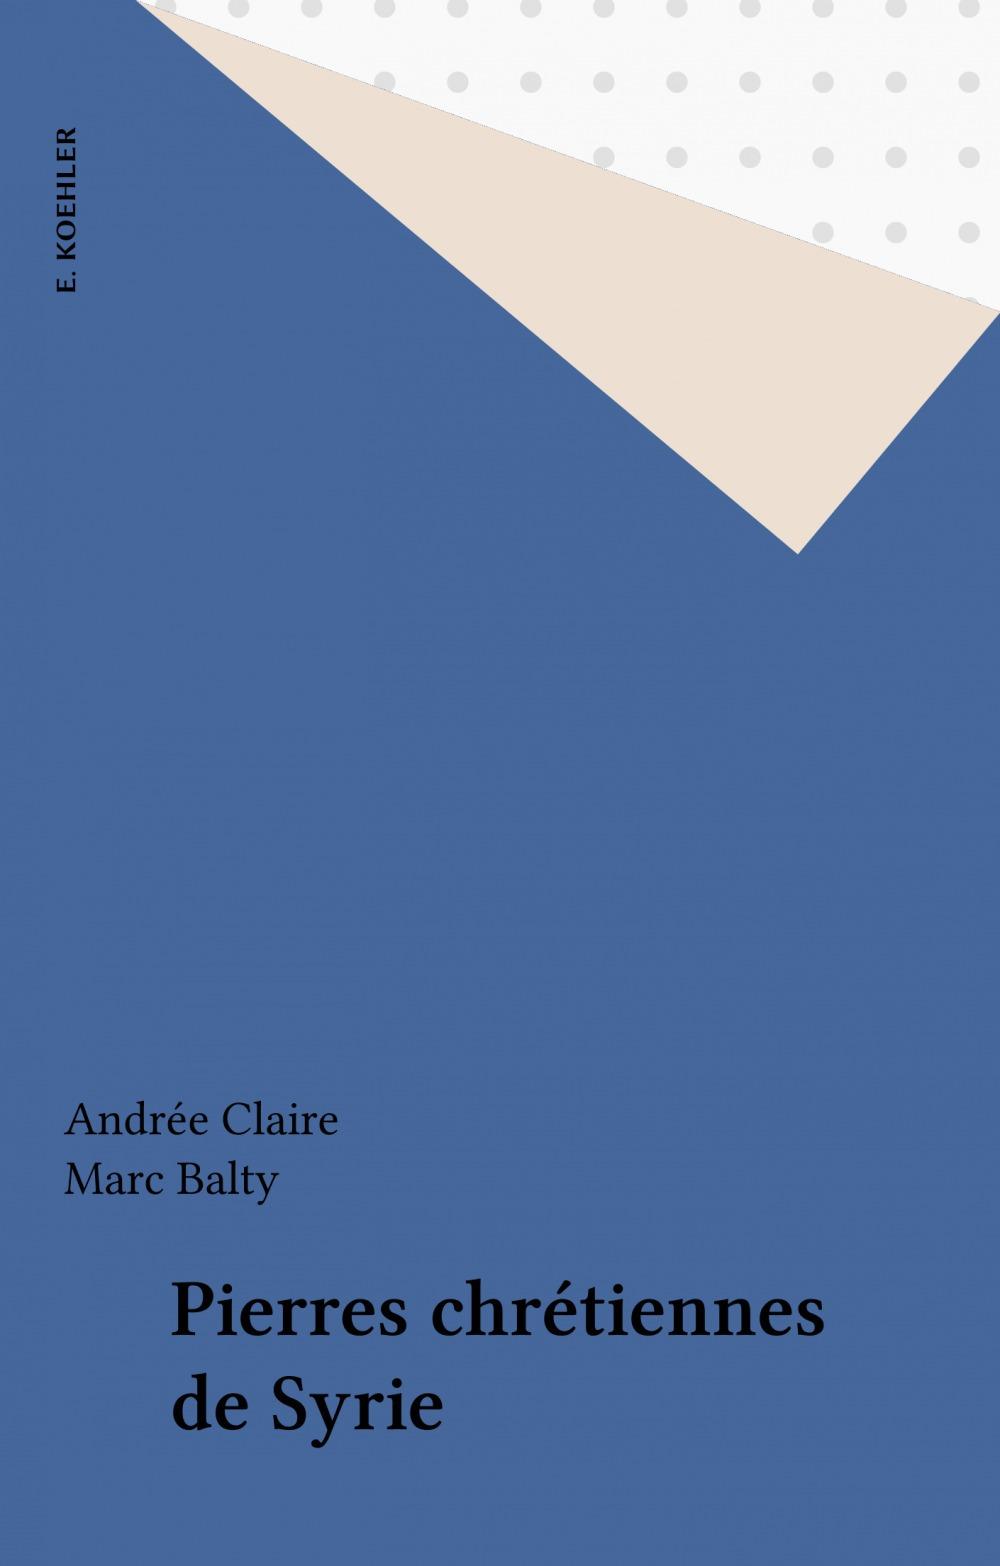 Pierres chrétiennes de Syrie  - Andree Claire  - Marc Balty